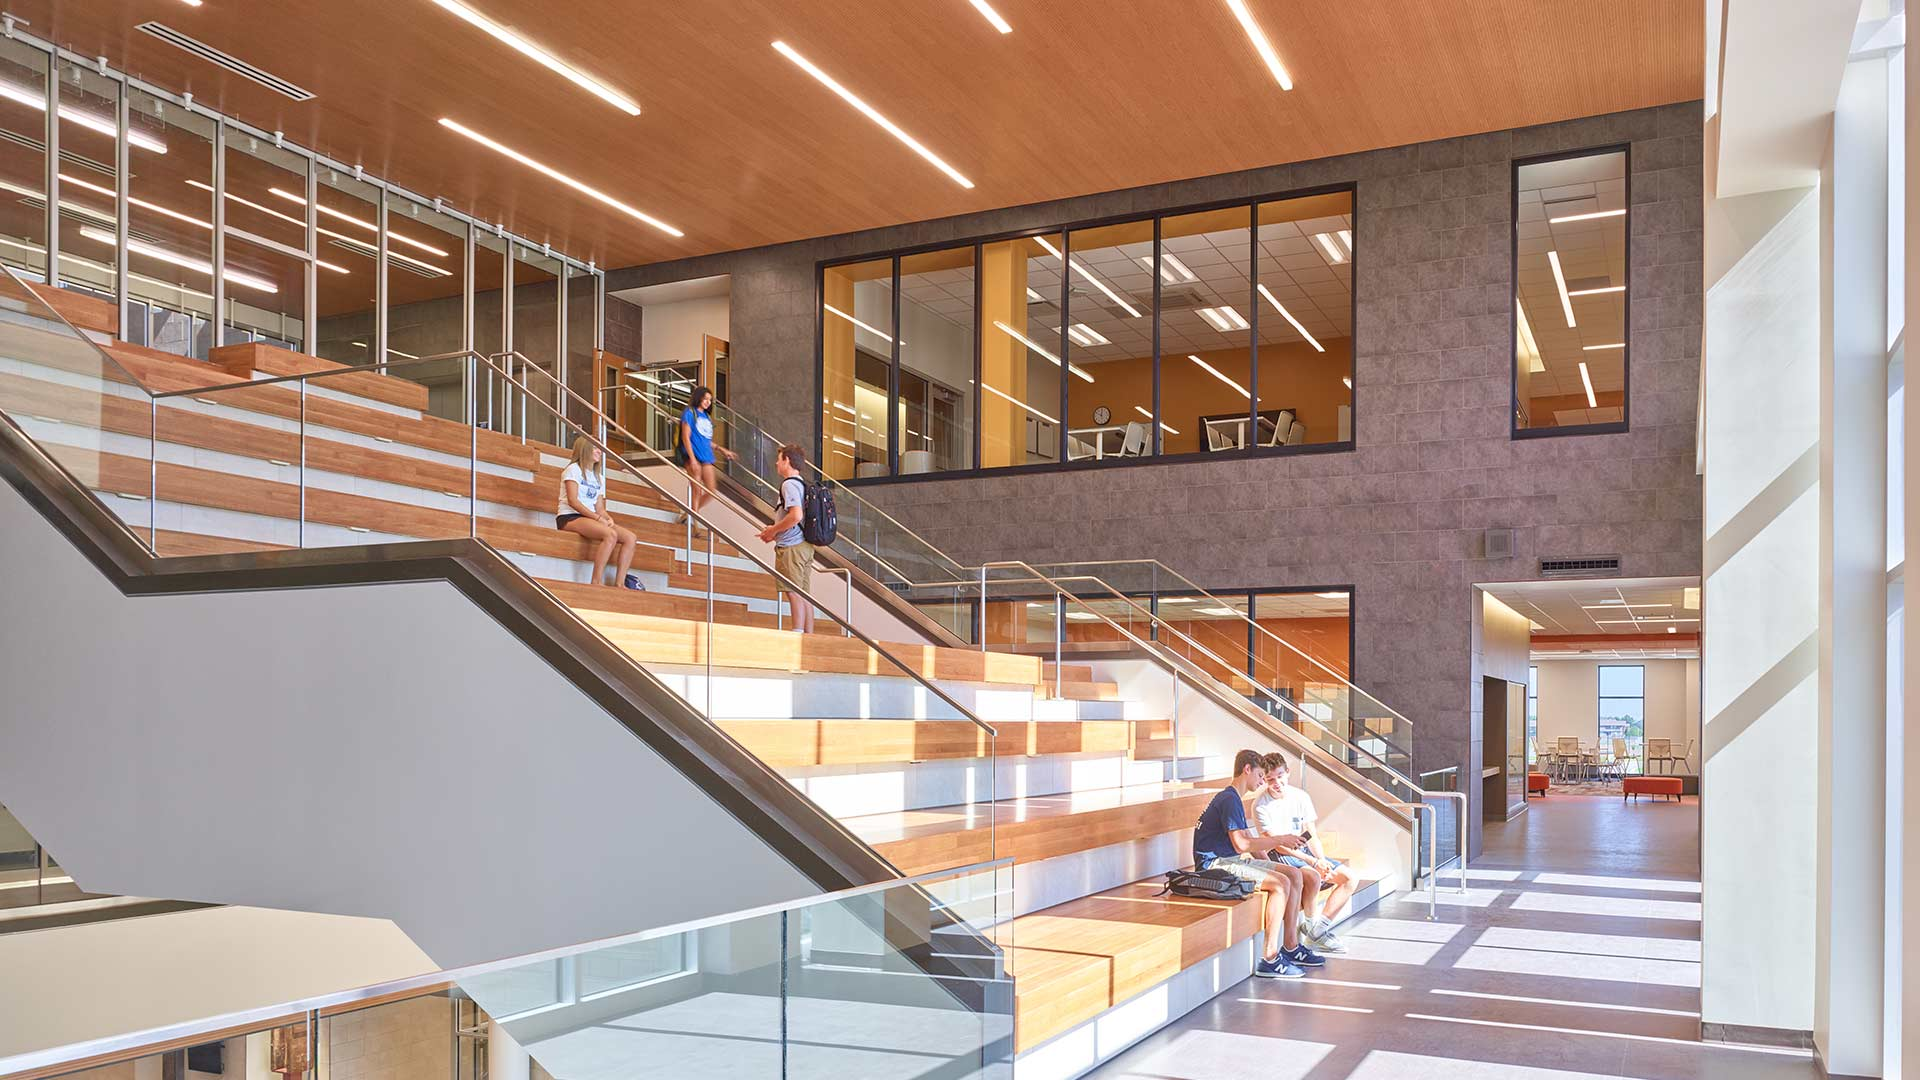 Olathe west high school hollis miller - Architecture and interior design schools ...